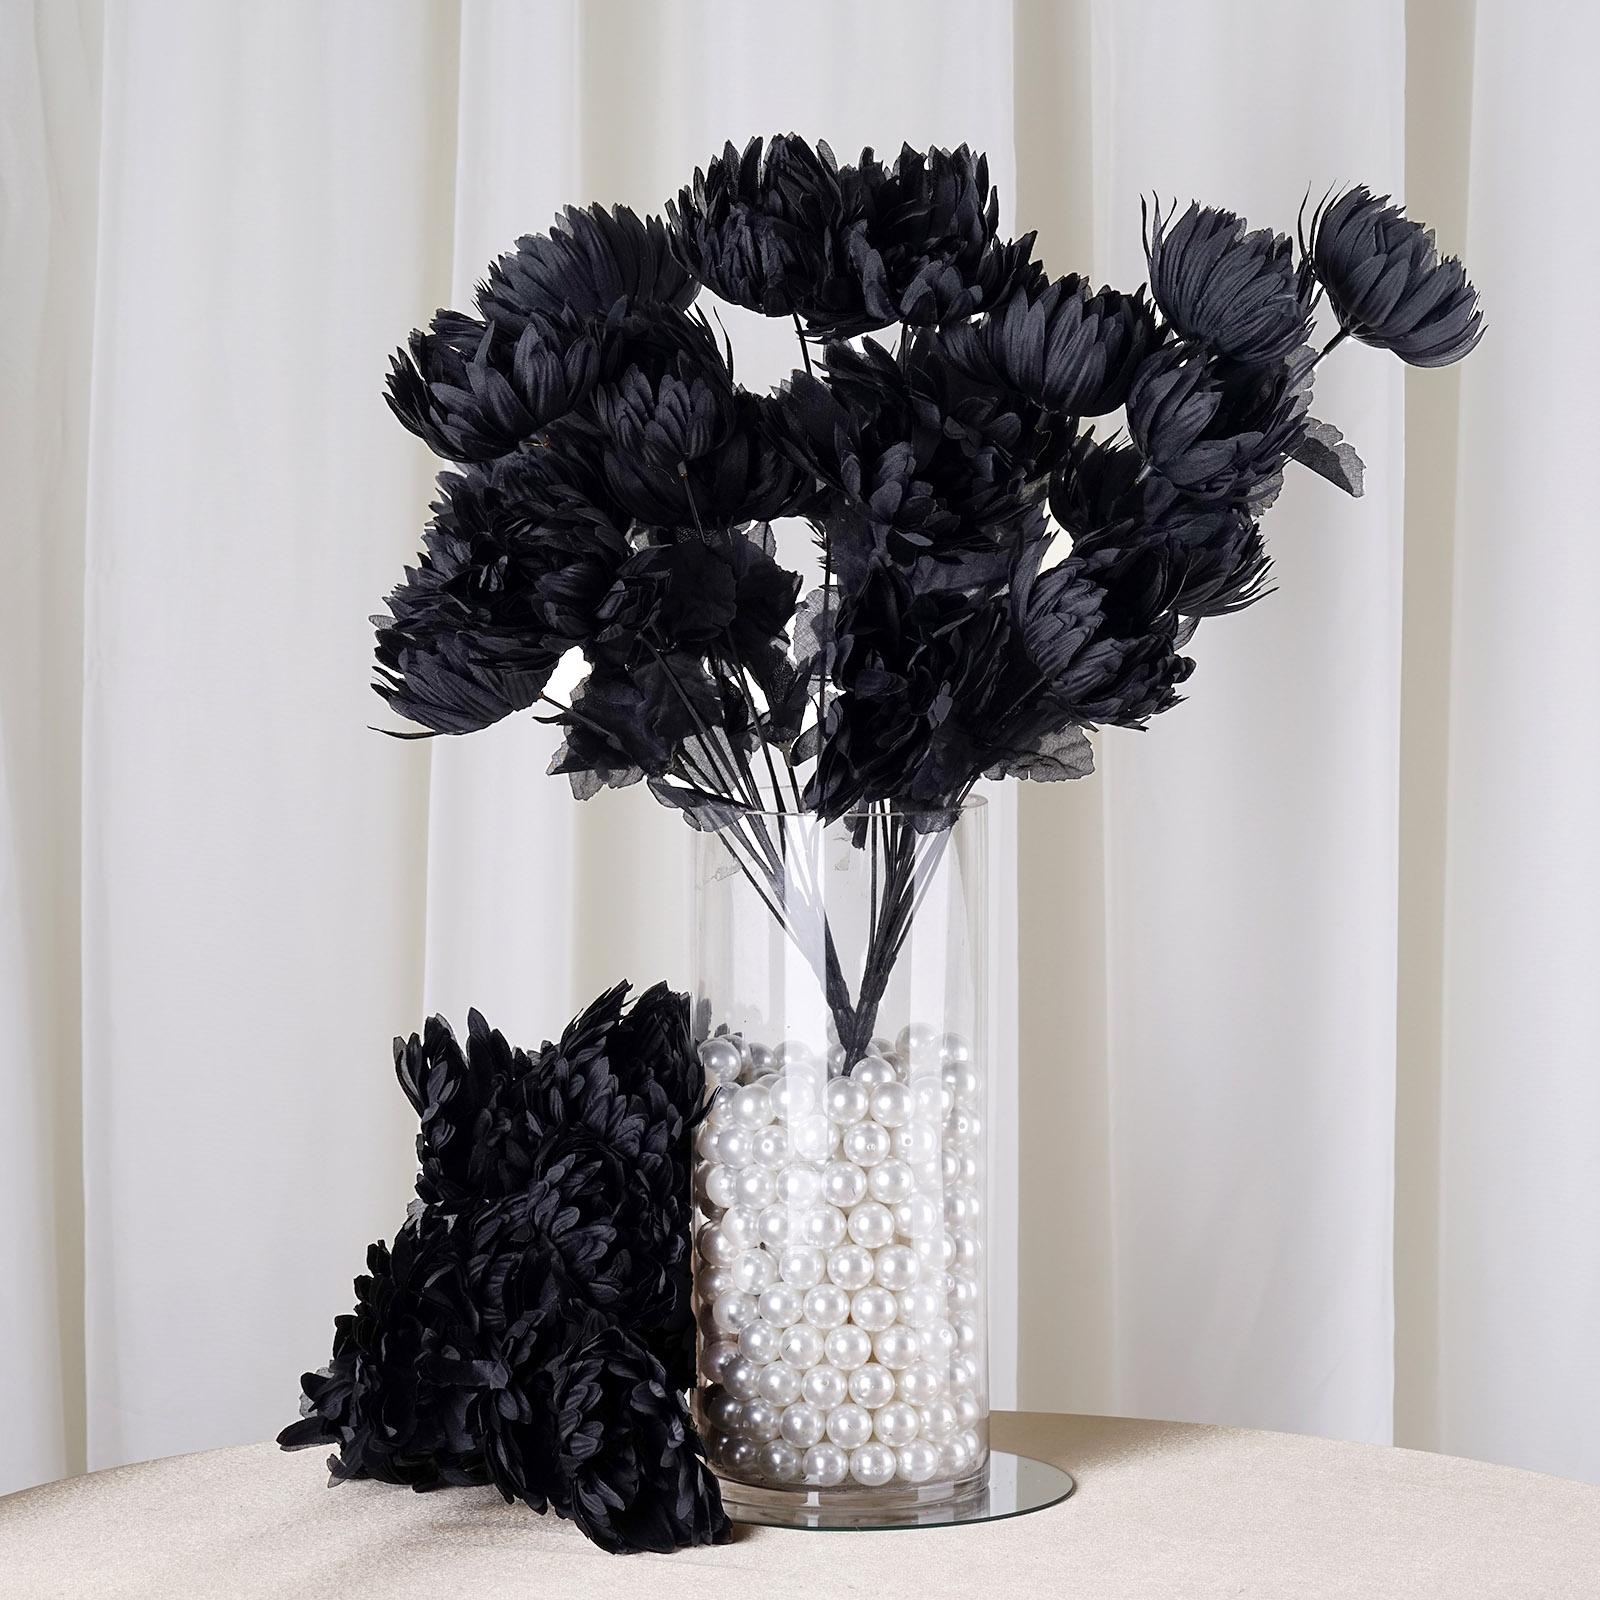 BalsaCircle 56 Silk Chrysanthemum Mums Flowers - DIY Autumn Home Wedding Party Artificial Bouquets Arrangements Centerpieces